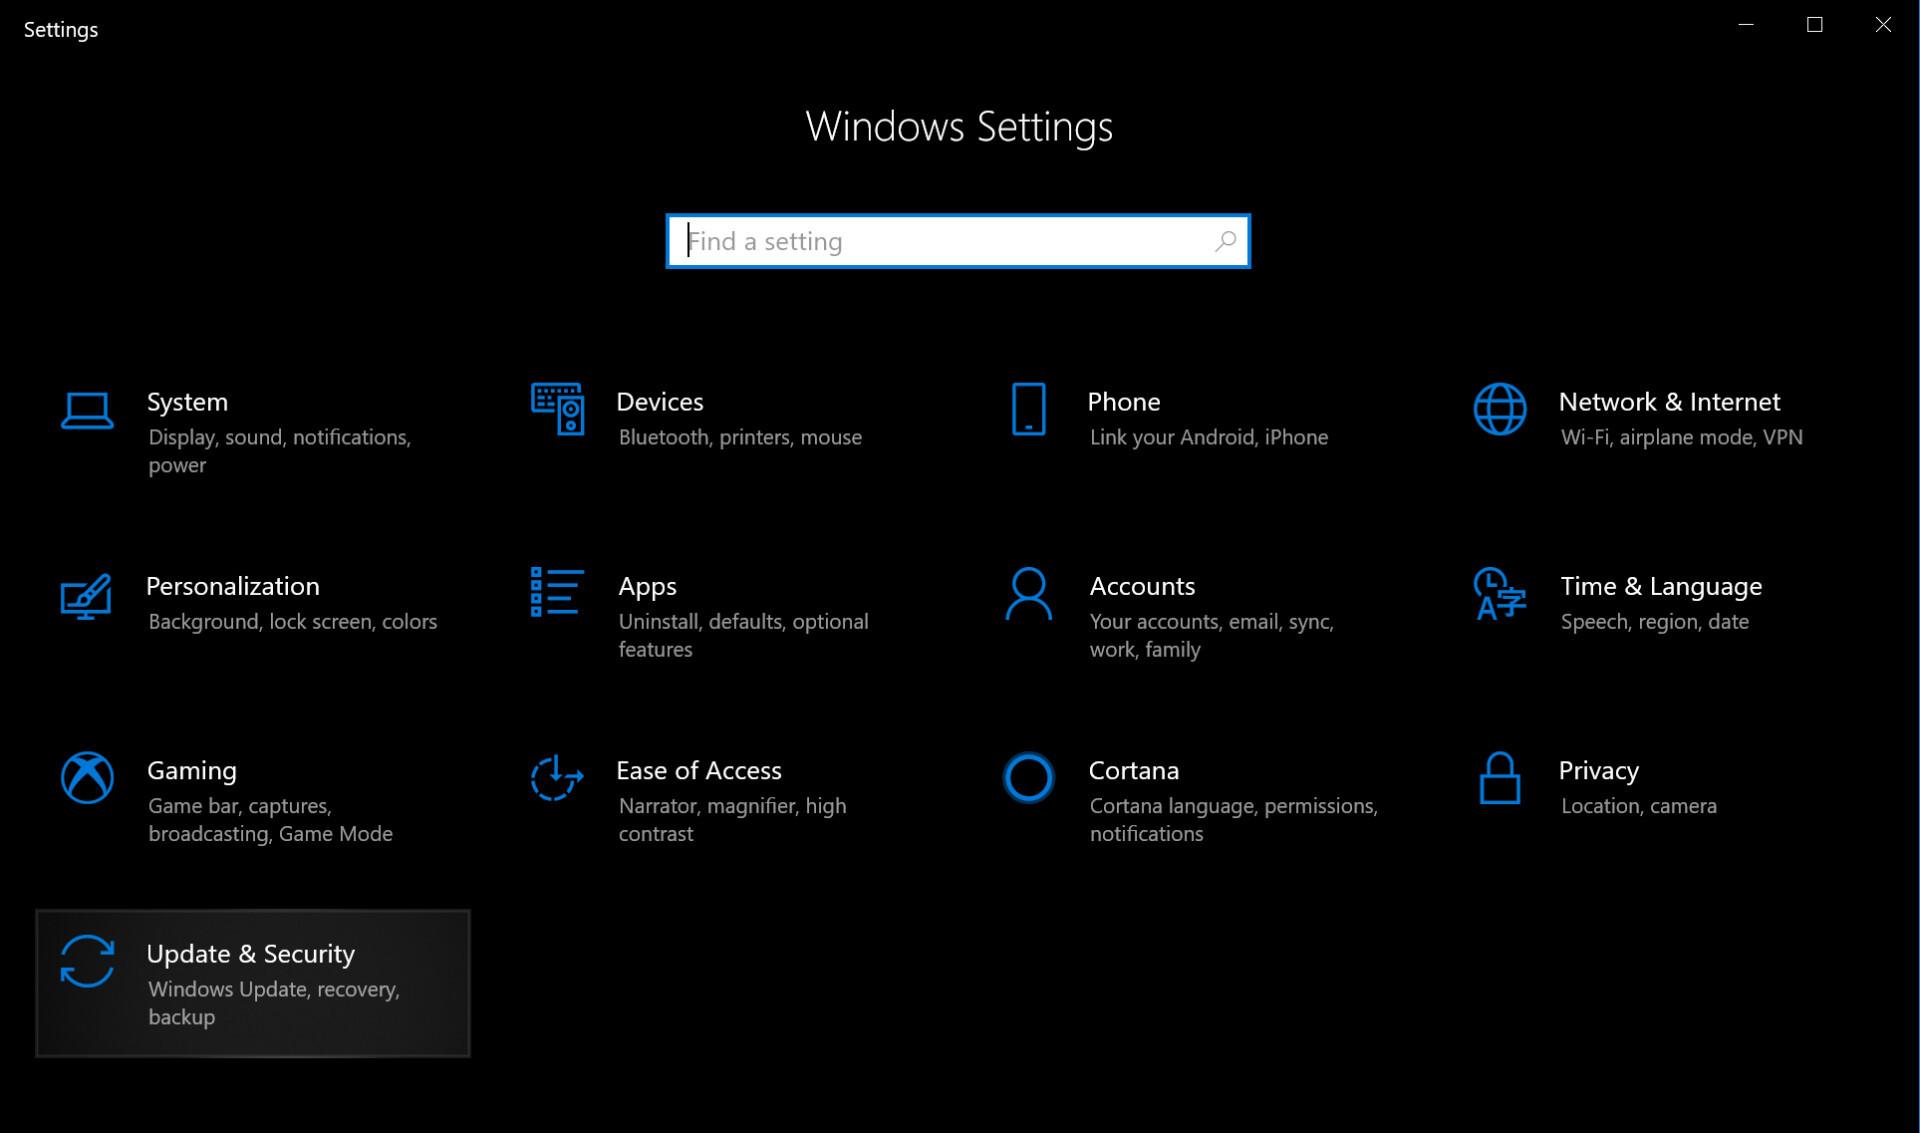 Screenshot of Windows 10 settings menu